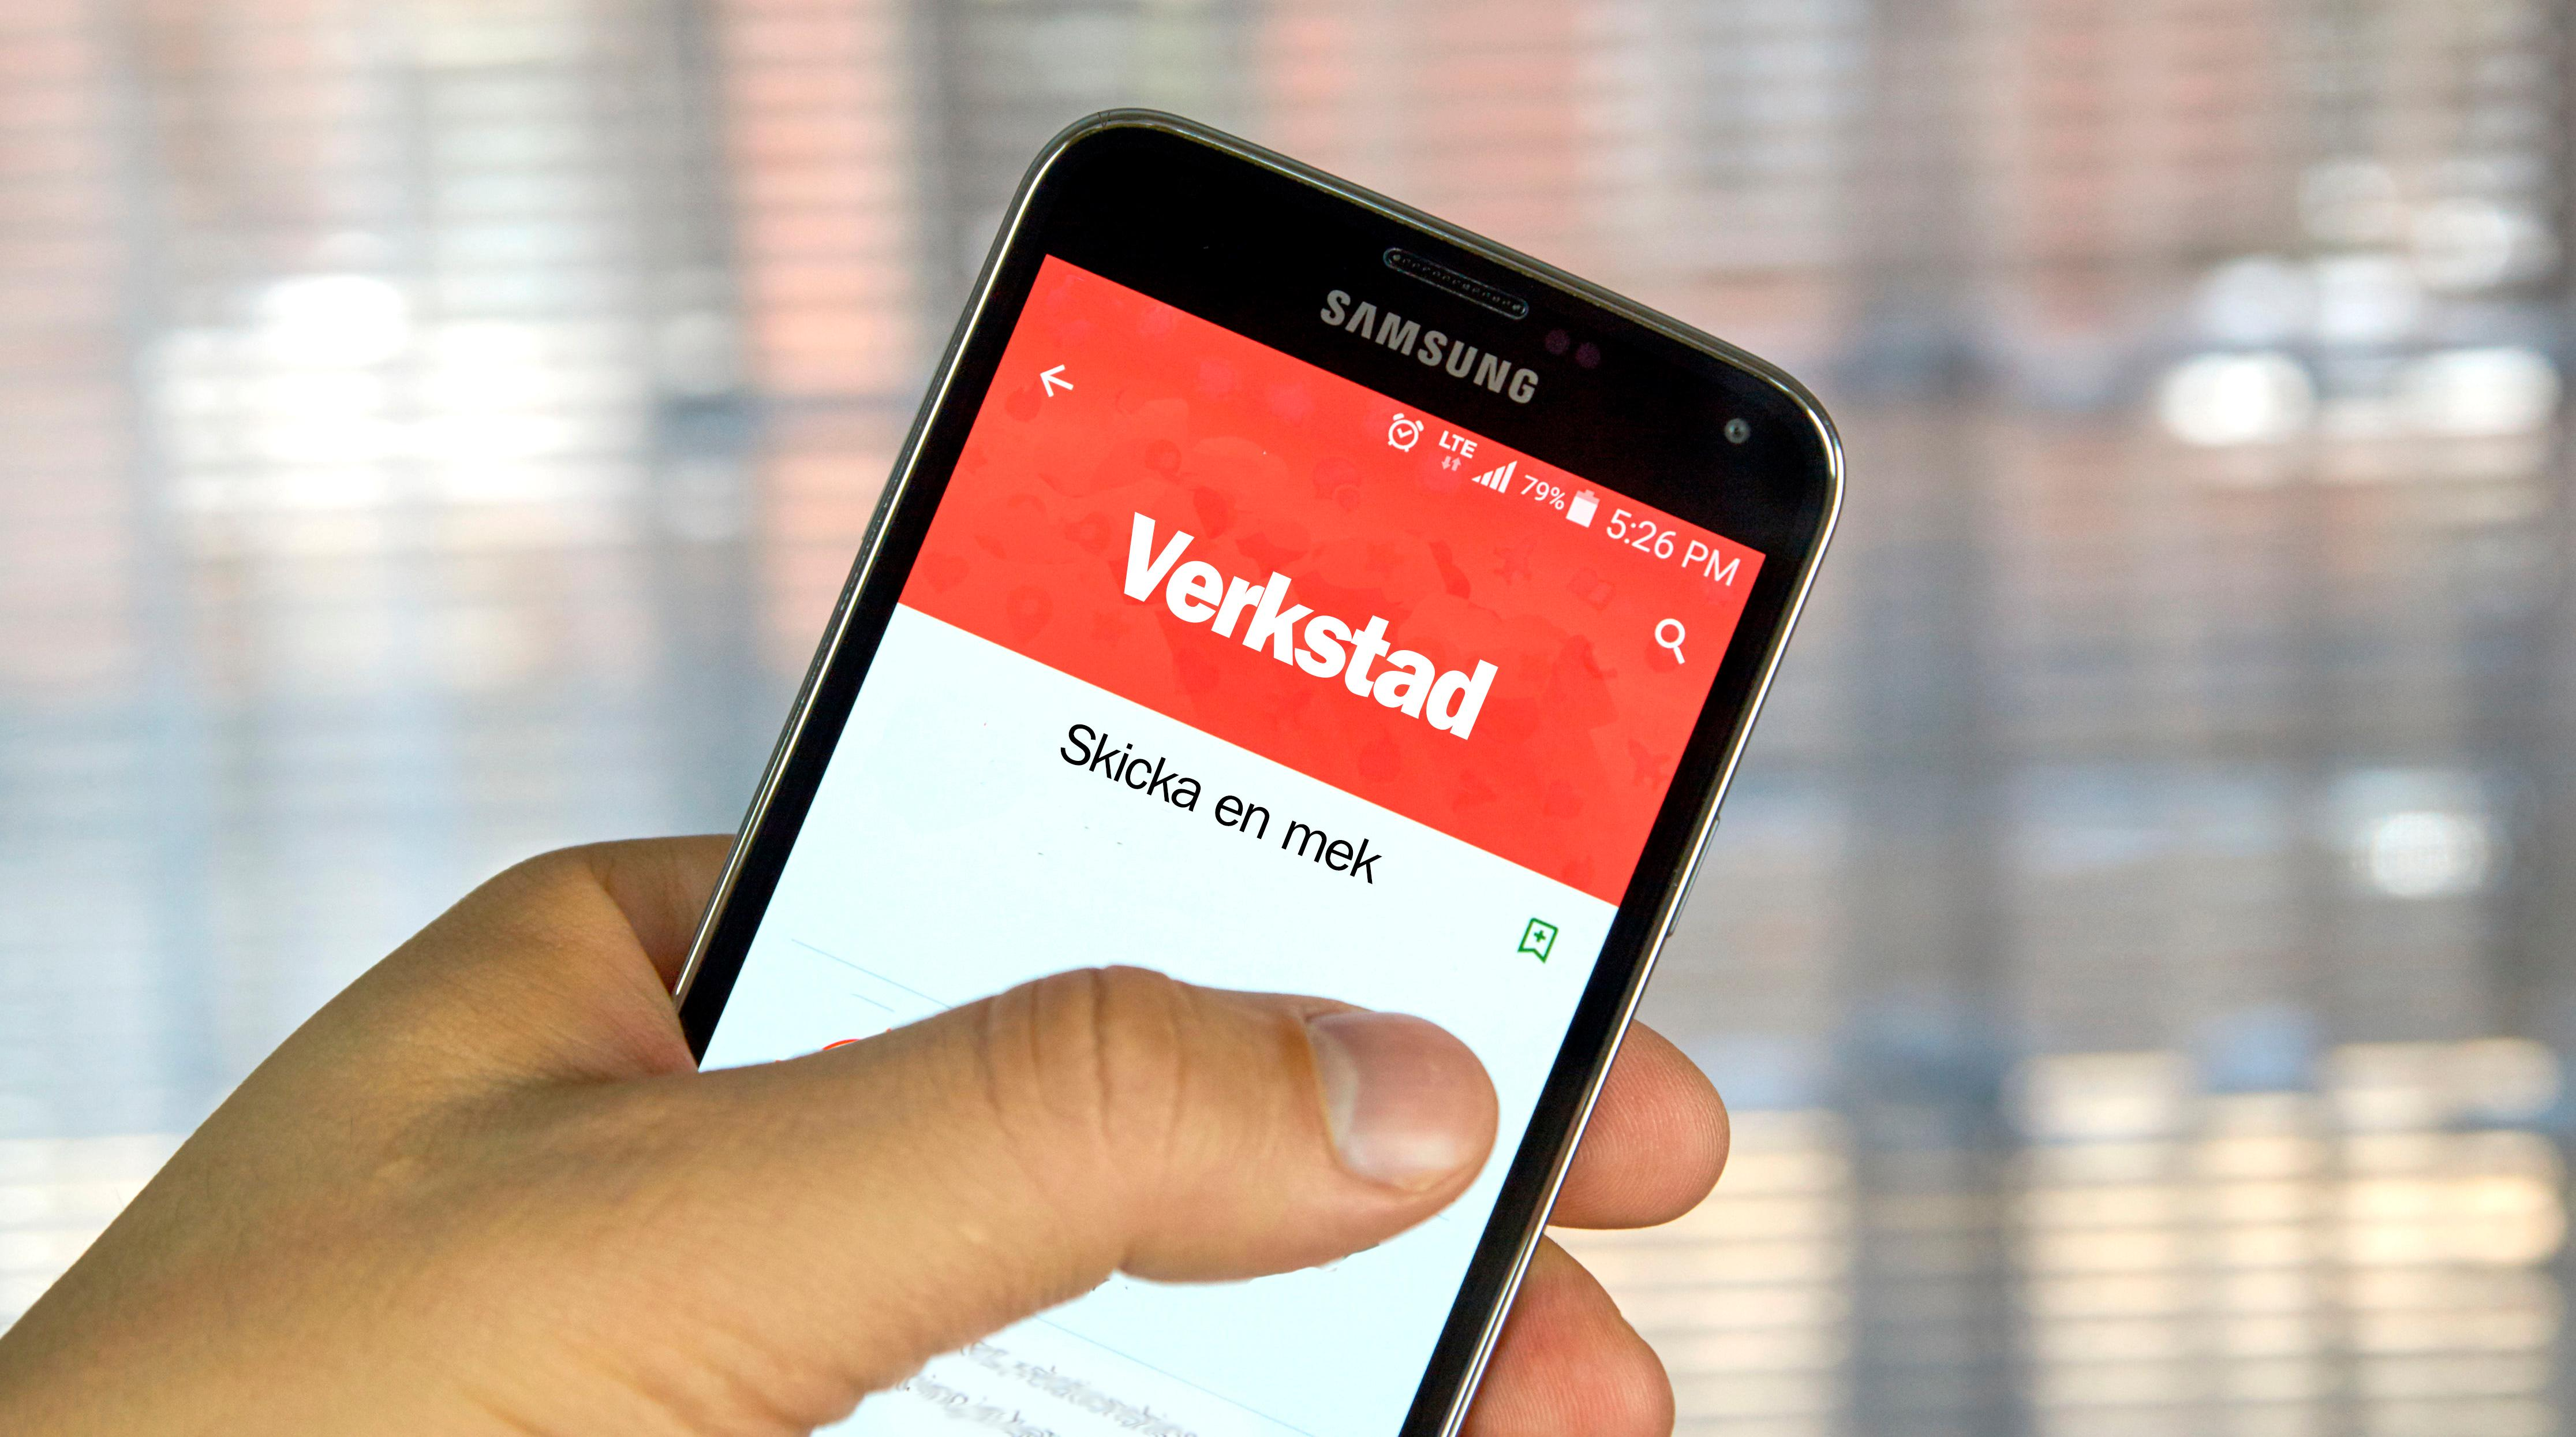 vrdels hajkropp on Twitter: tinder torsby vad hnder